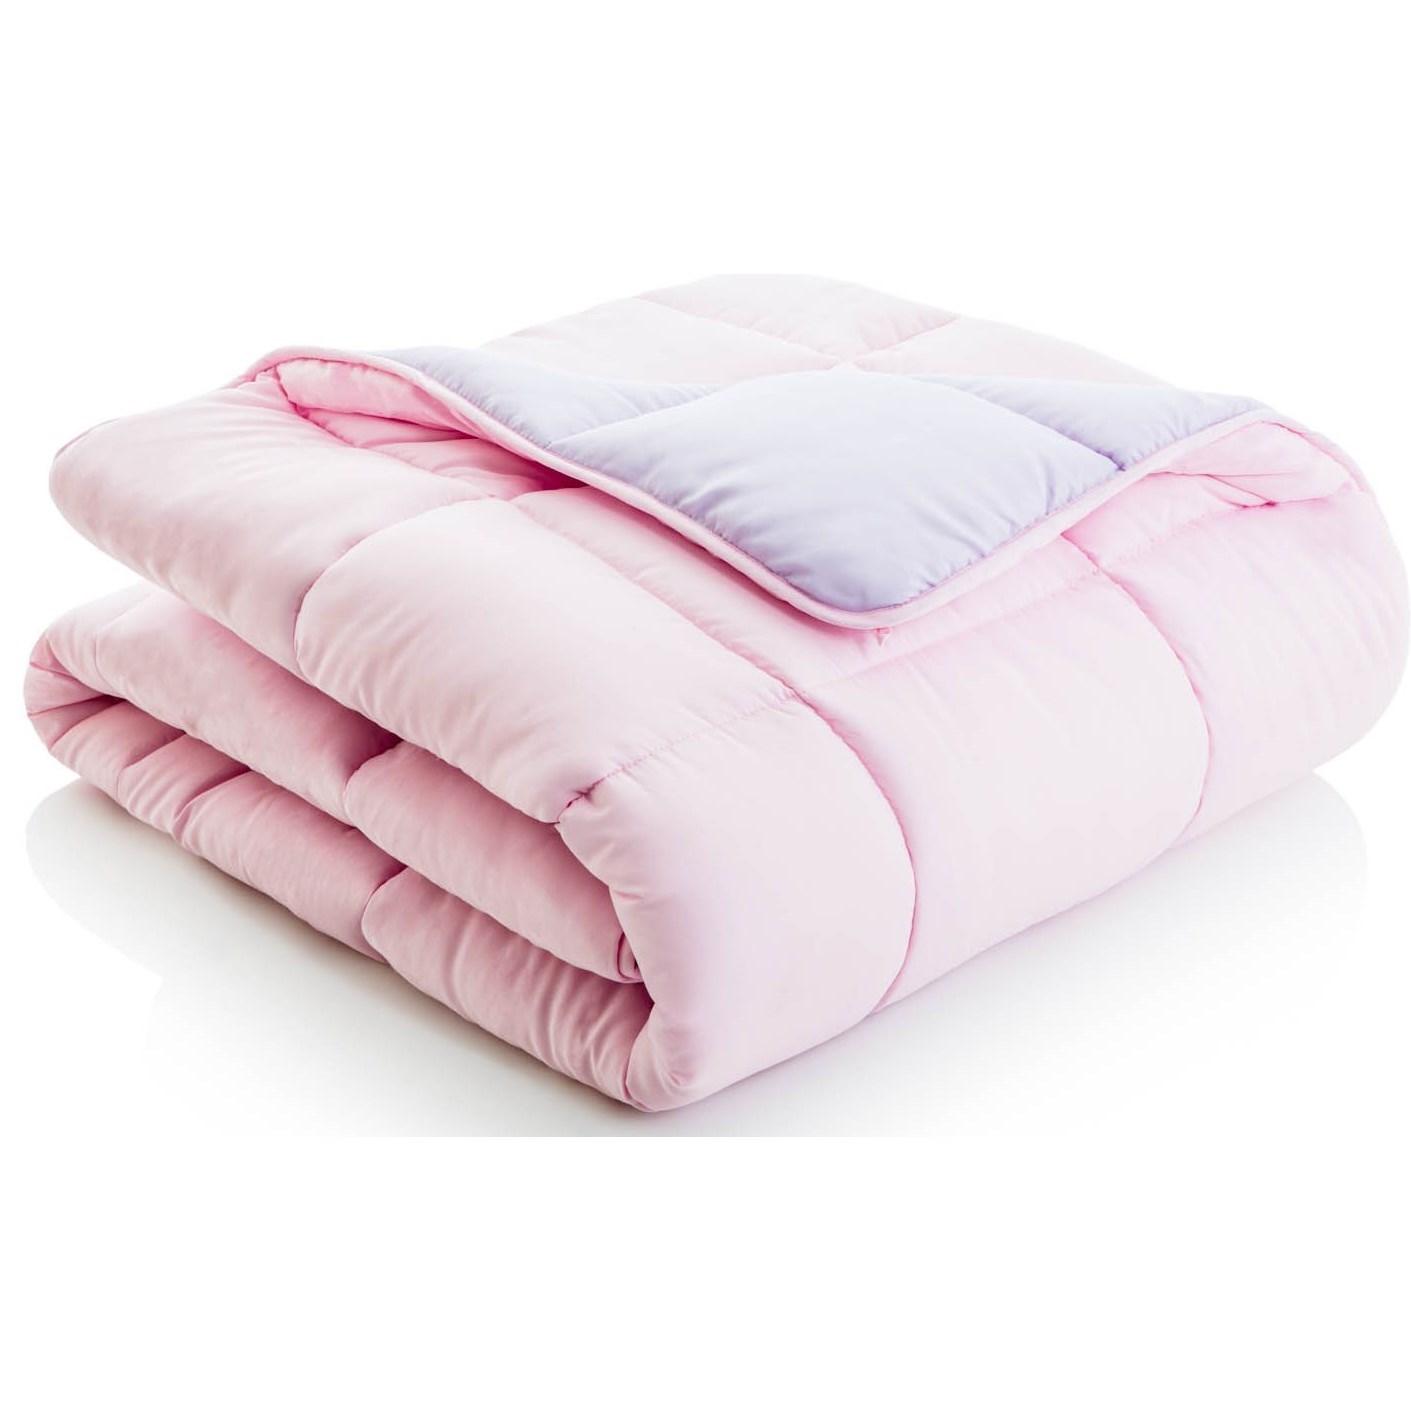 Malouf Reversible Bed in a Bag Split Cal King Reversible Bed in a Bag - Item Number: MA01SCLIBHBB